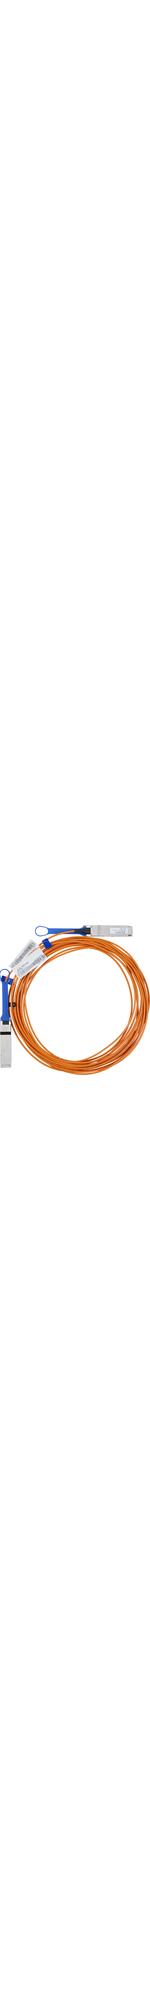 Mellanox Fibre Optic Network Cable for Network Device - 10.06 m - 1 x QSFP Male Network - 1 x QSFP Male Network